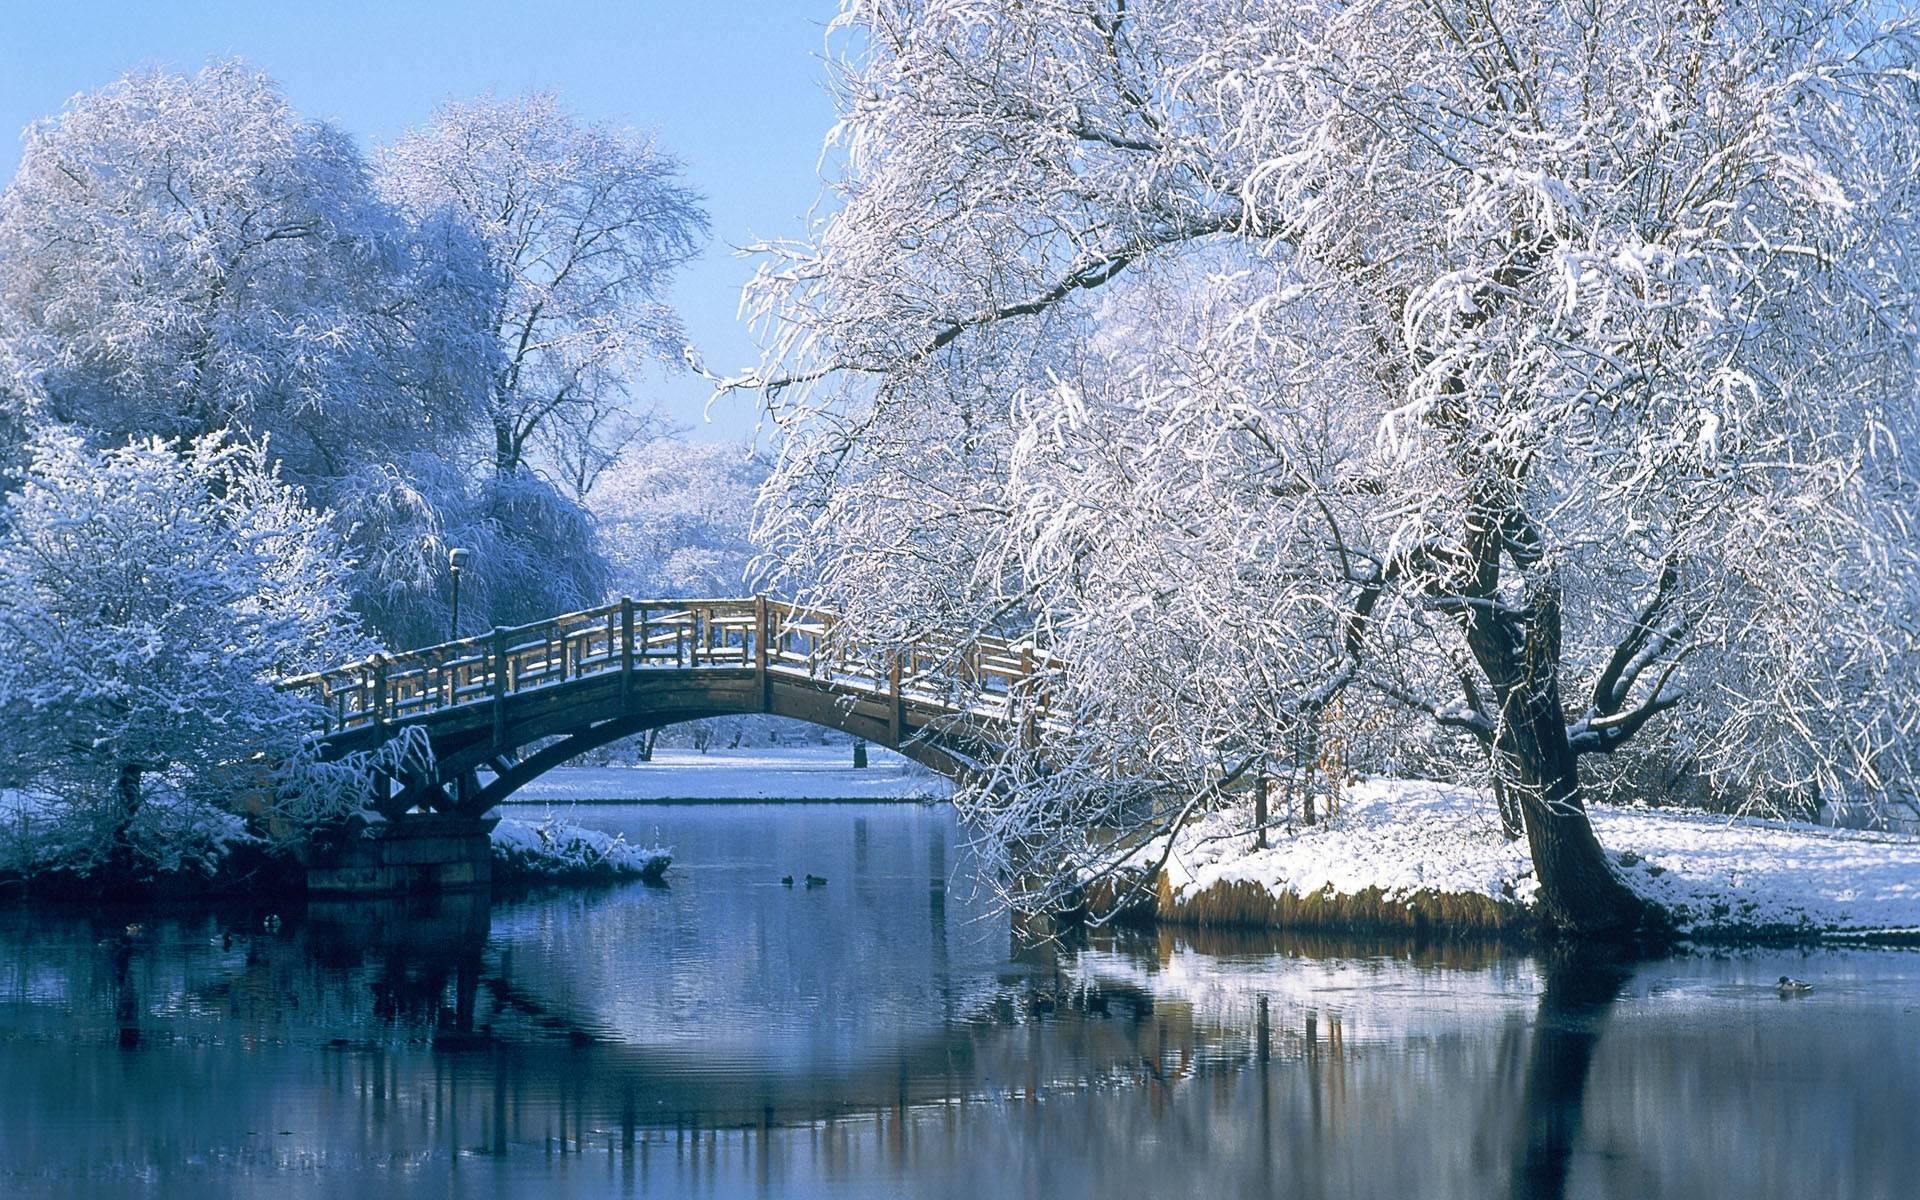 Winter Scenes for Desktop Wallpapers – HD Wallpapers Inn